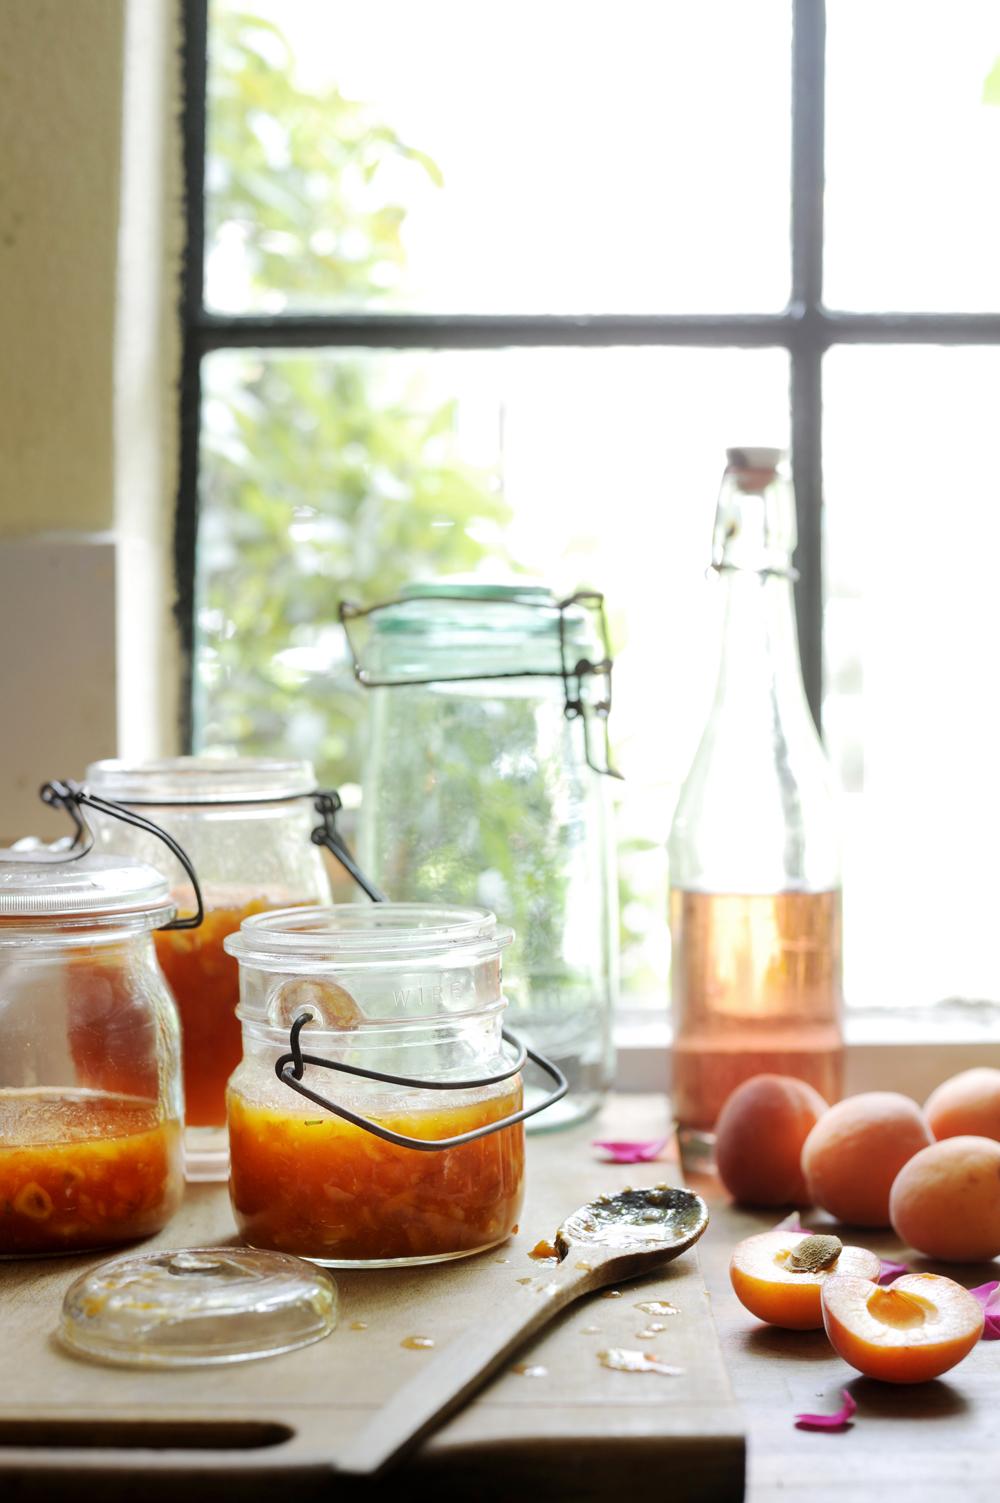 abrikozenjam met hazelnoten en rozen